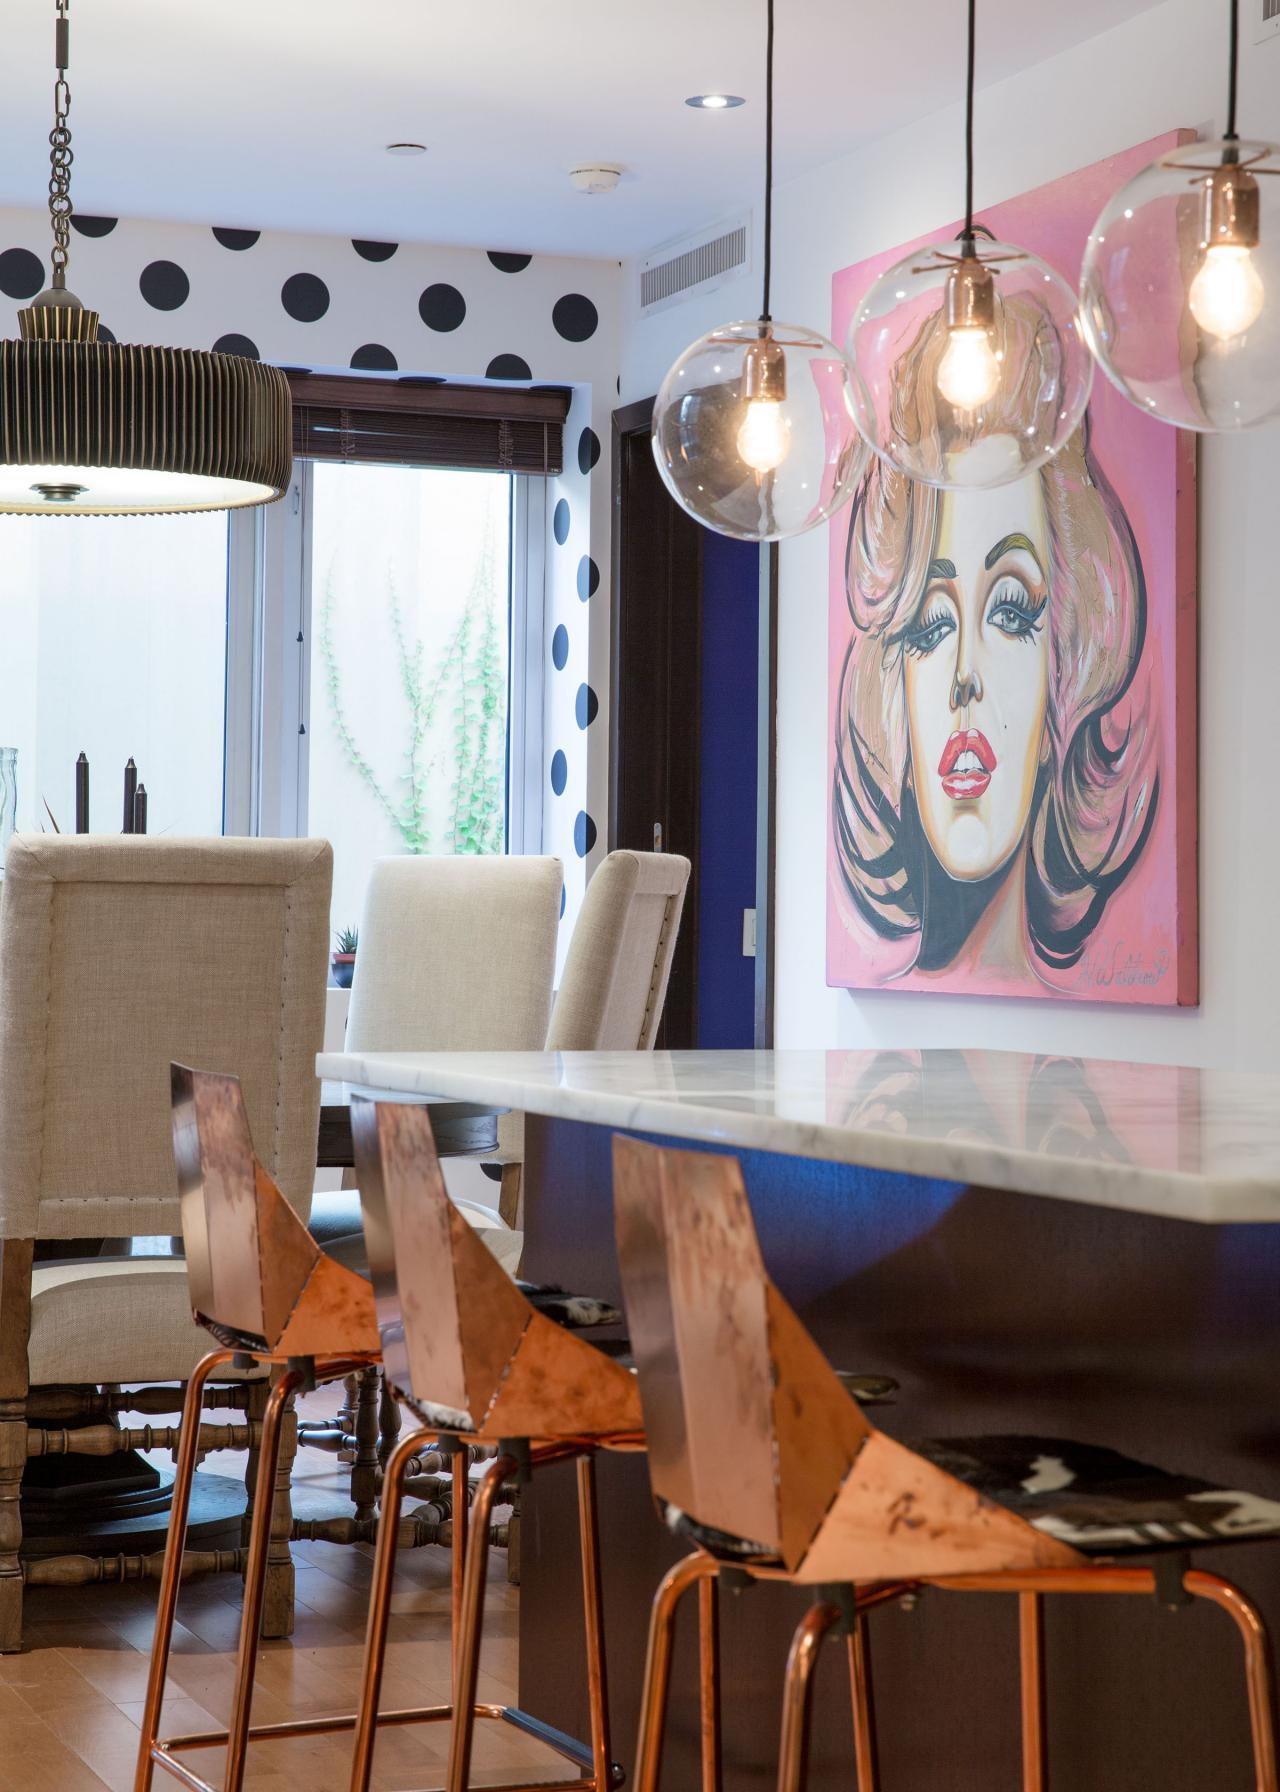 Dining Room Includes Pop Art Marilyn